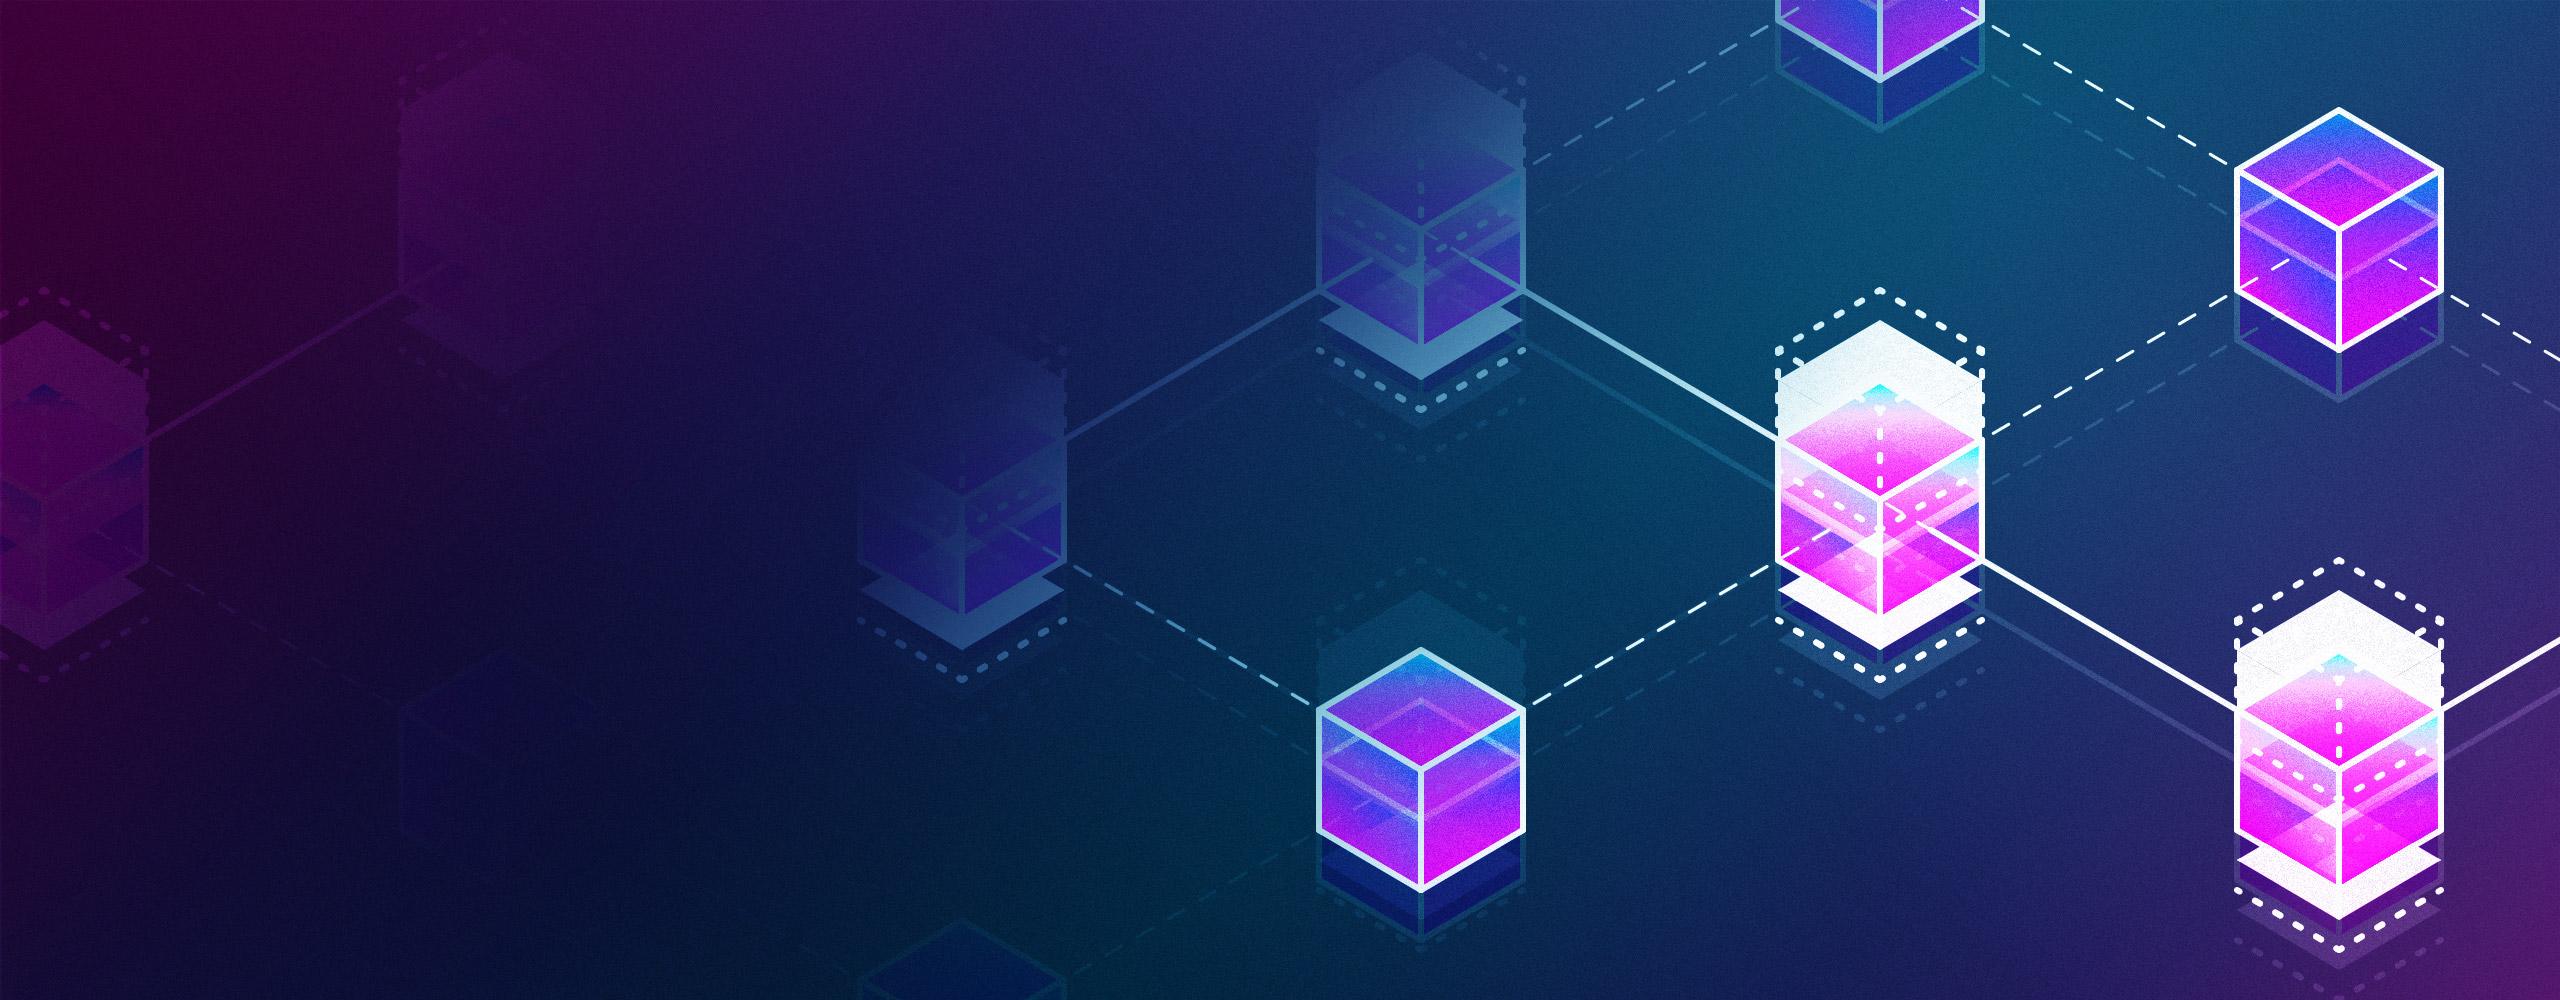 Introducing vMX